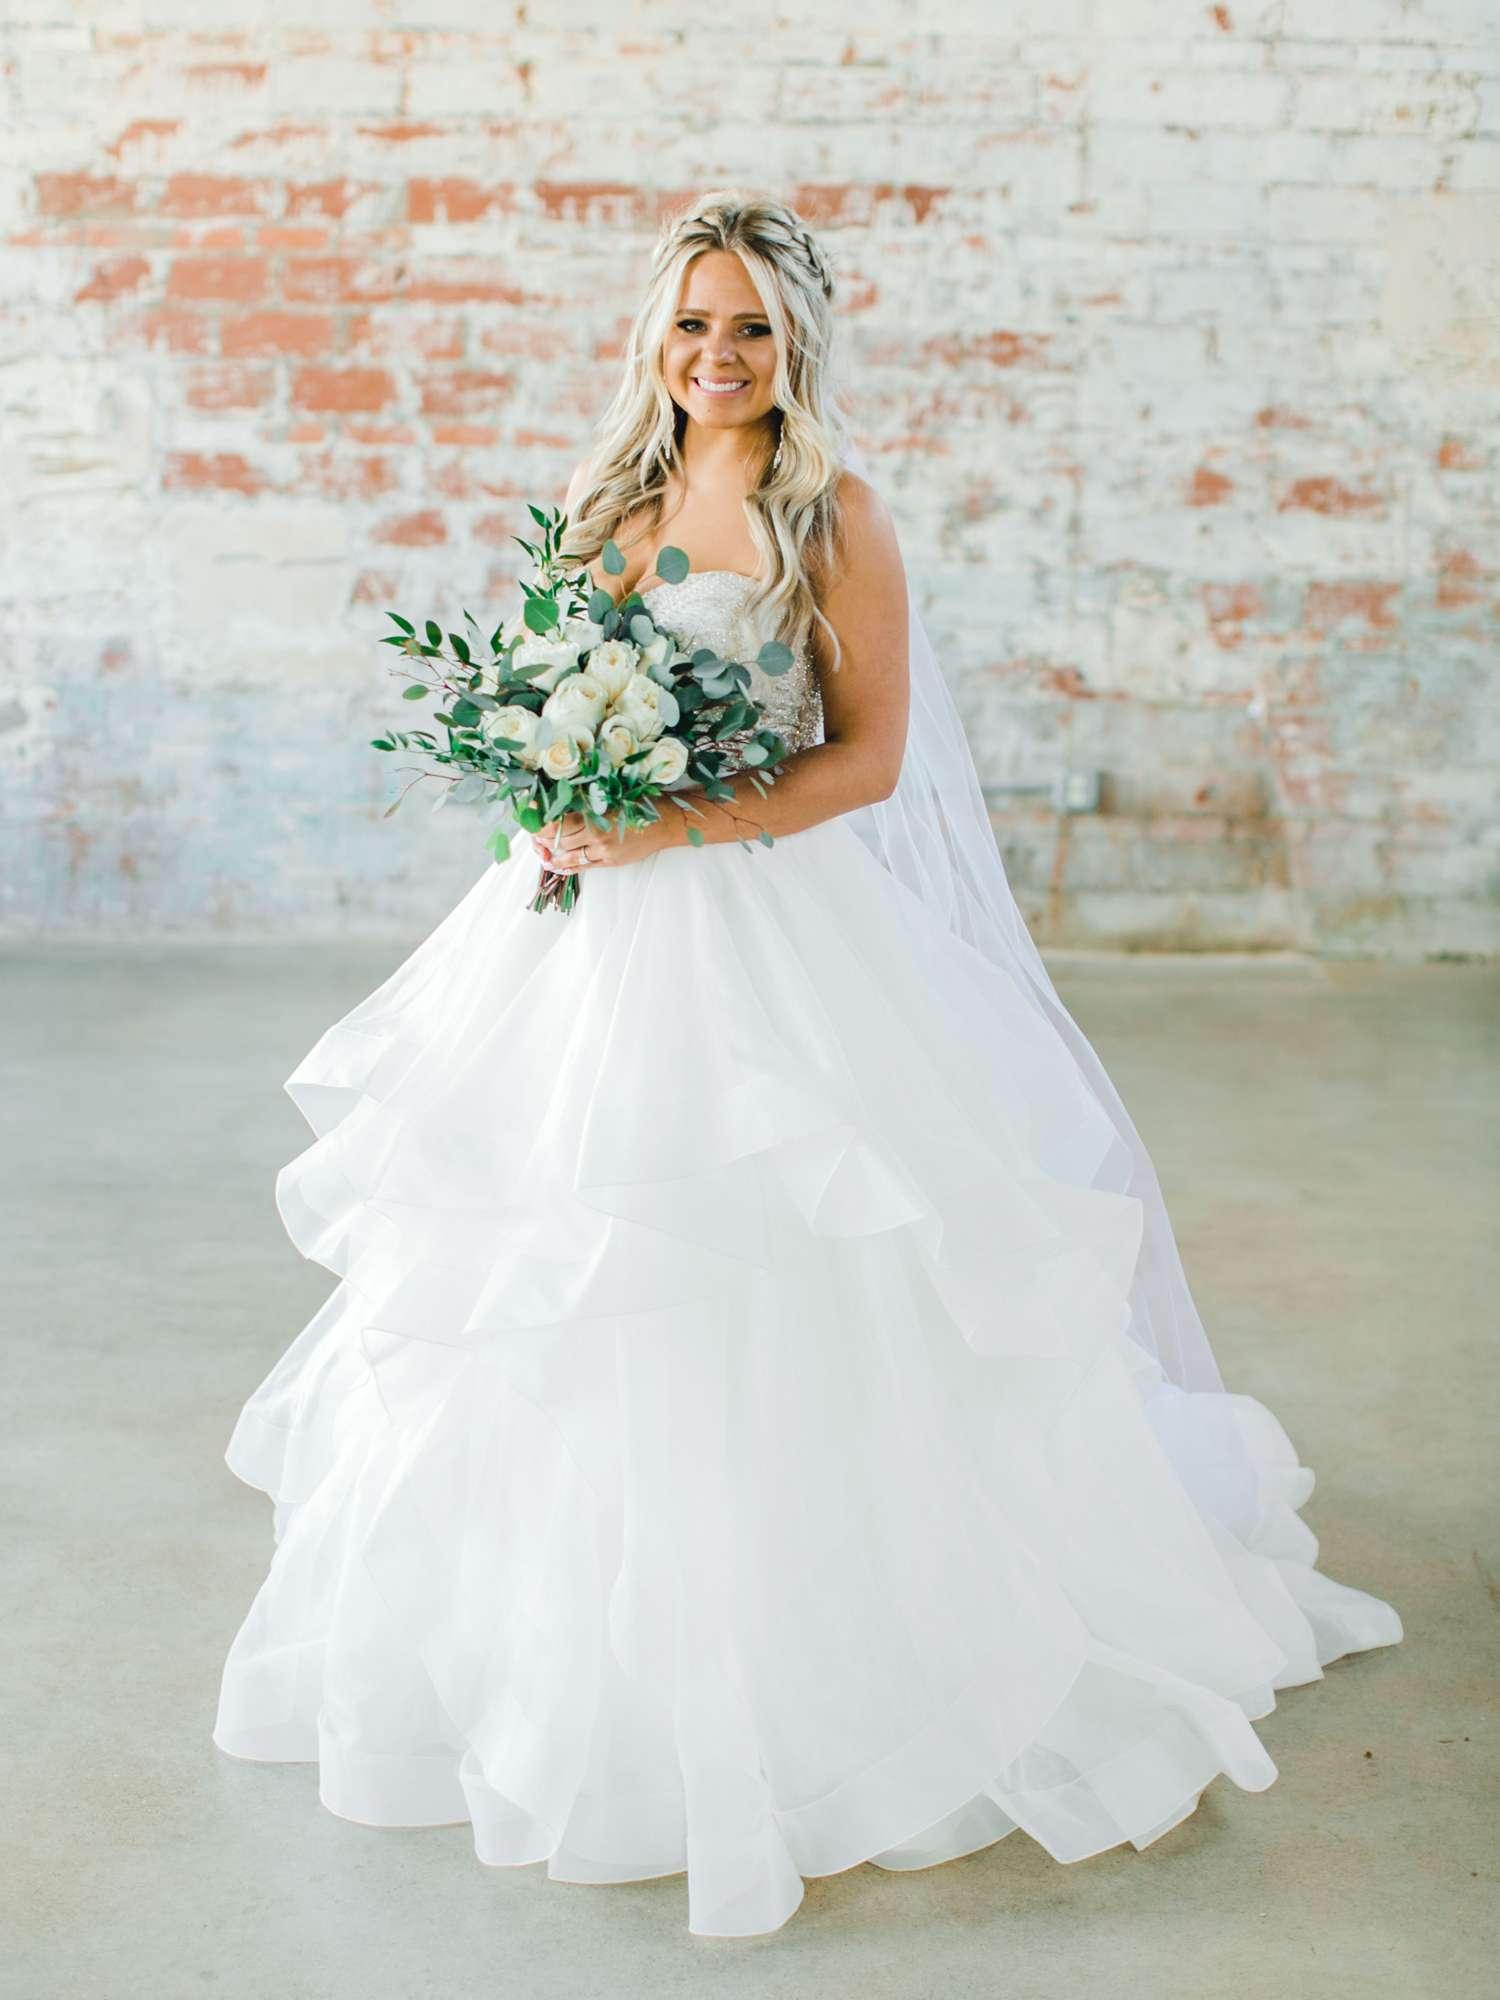 HAYLEE_DAVIS_ALLEEJ_LUBBOCK_WEDDING_PHOTOGRAPHER_BRIDALS_0001.jpg